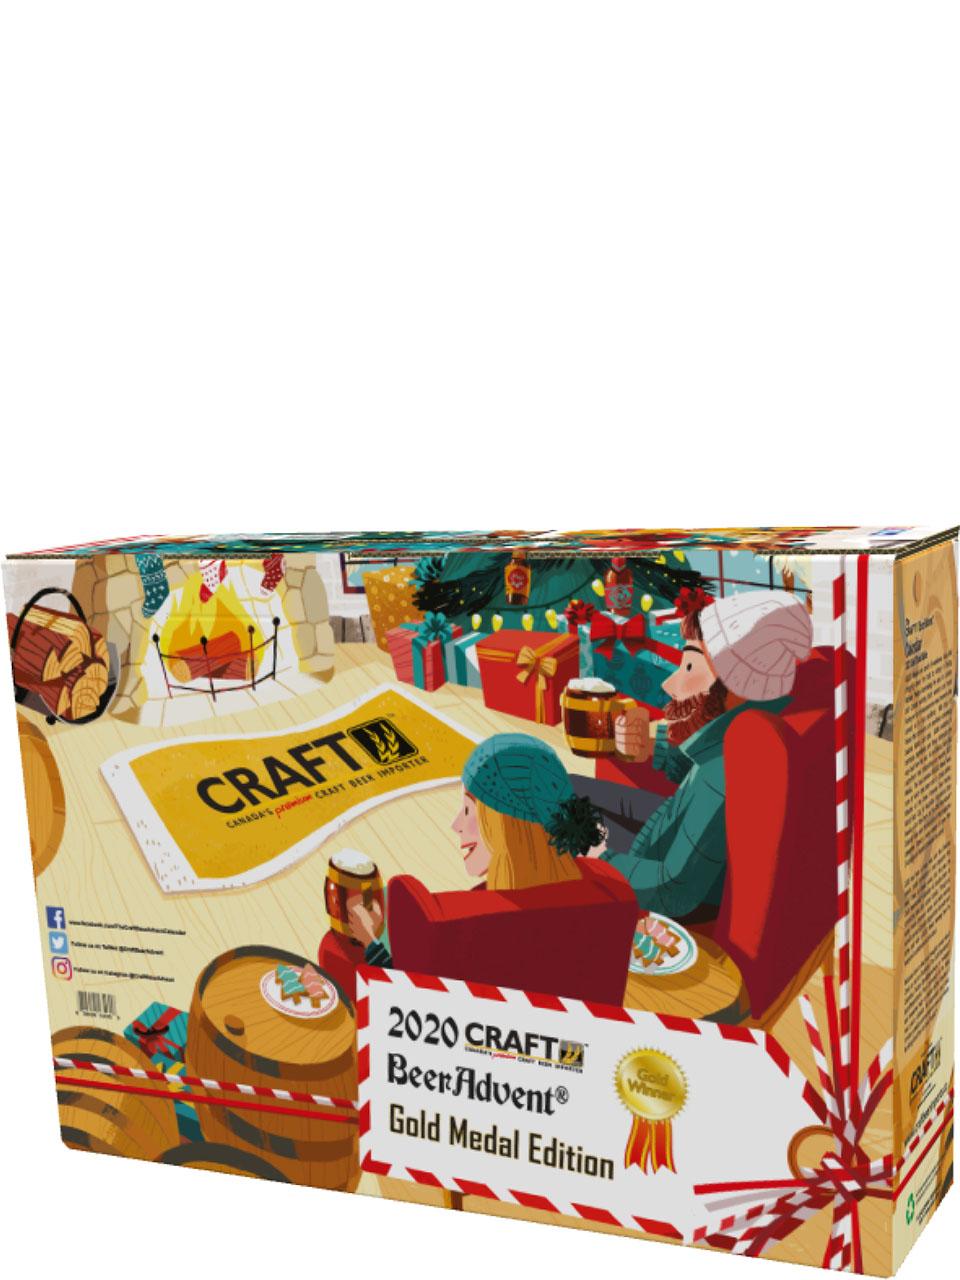 Craft BeerAdvent Calendar 2020 Gold Medal Edition